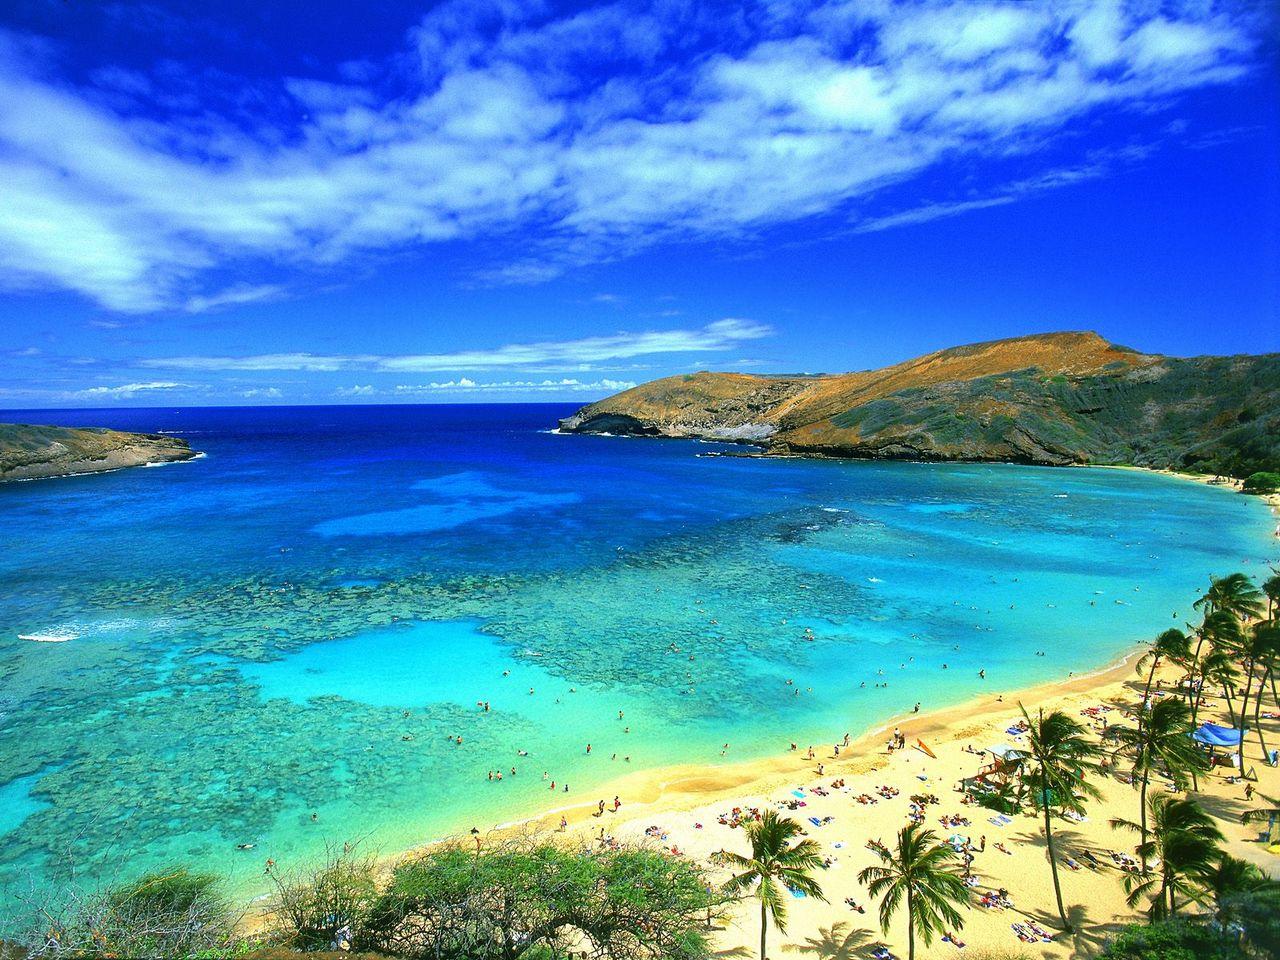 http://4.bp.blogspot.com/-61Q8JEd3WPM/TiqlMNoMdwI/AAAAAAAAJl4/yXXhnYIowB4/s1600/Hanauma_Bay%252C_Oahu%252C_Hawaii___erc.jpg